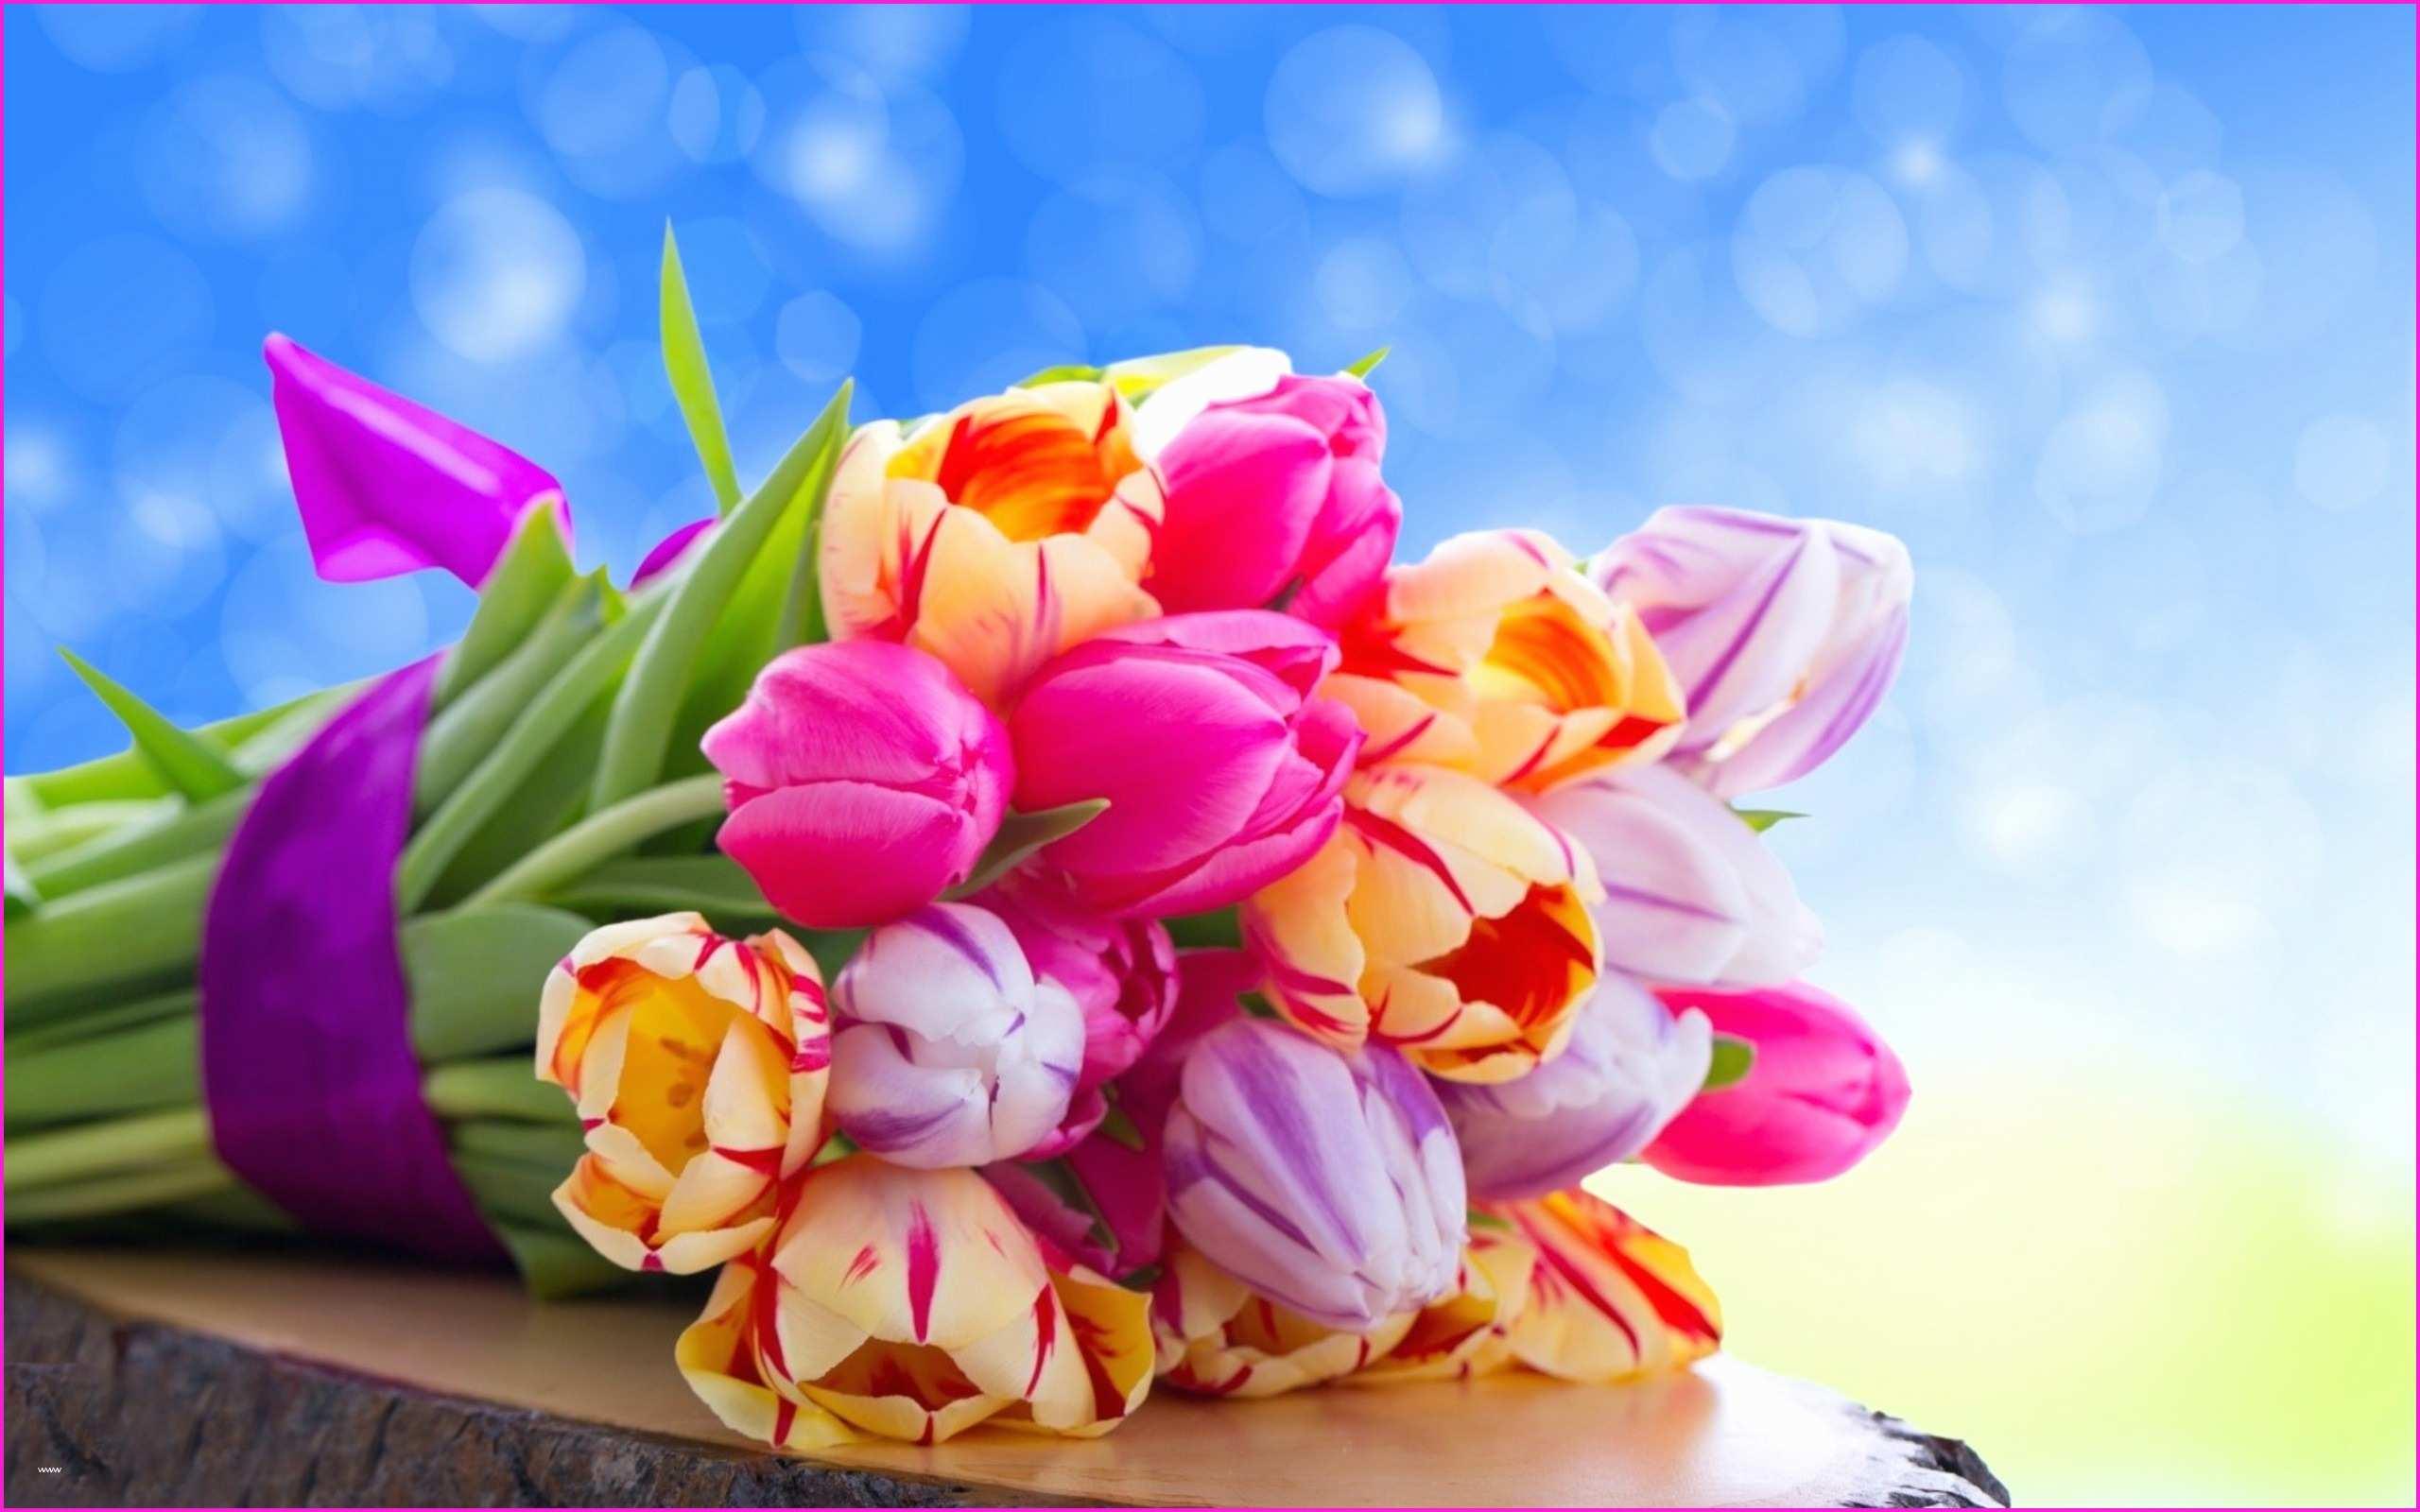 Bouquet Of Flowers Tulips Pleasant Bouquet Of Tulips - Beautiful Love Wallpapers For Desktop Full Screen , HD Wallpaper & Backgrounds